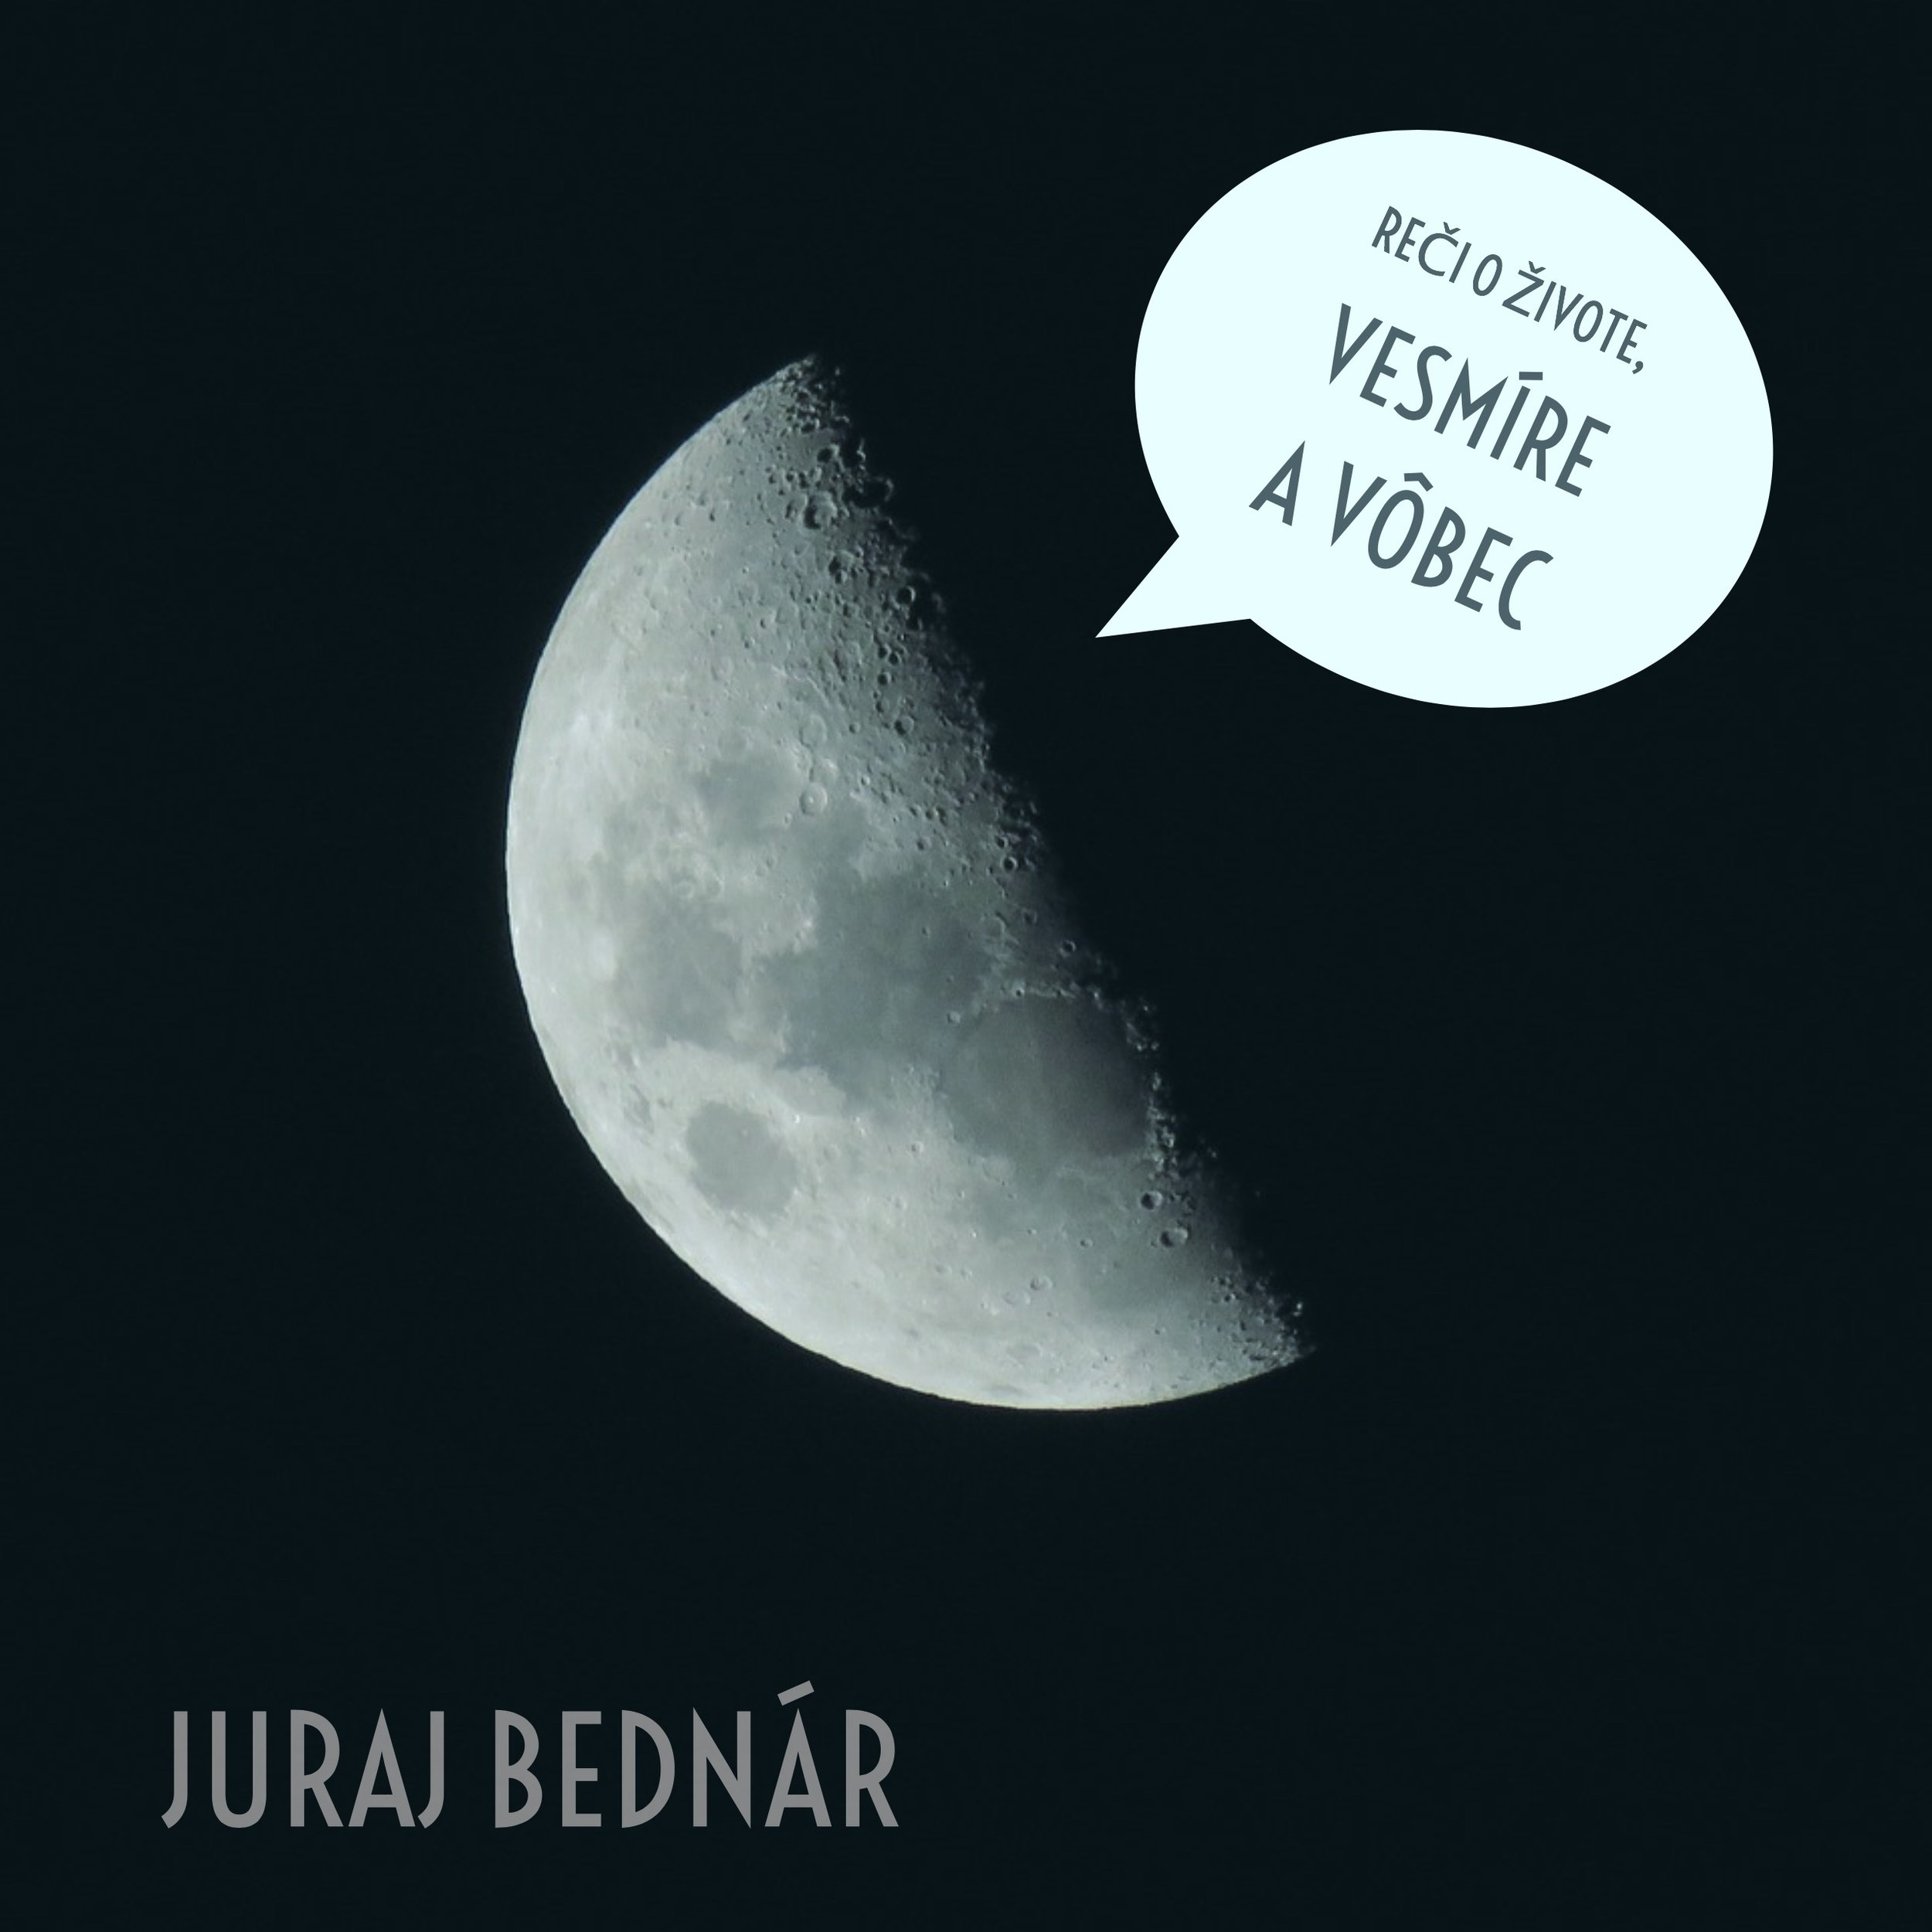 Juraj Bednár